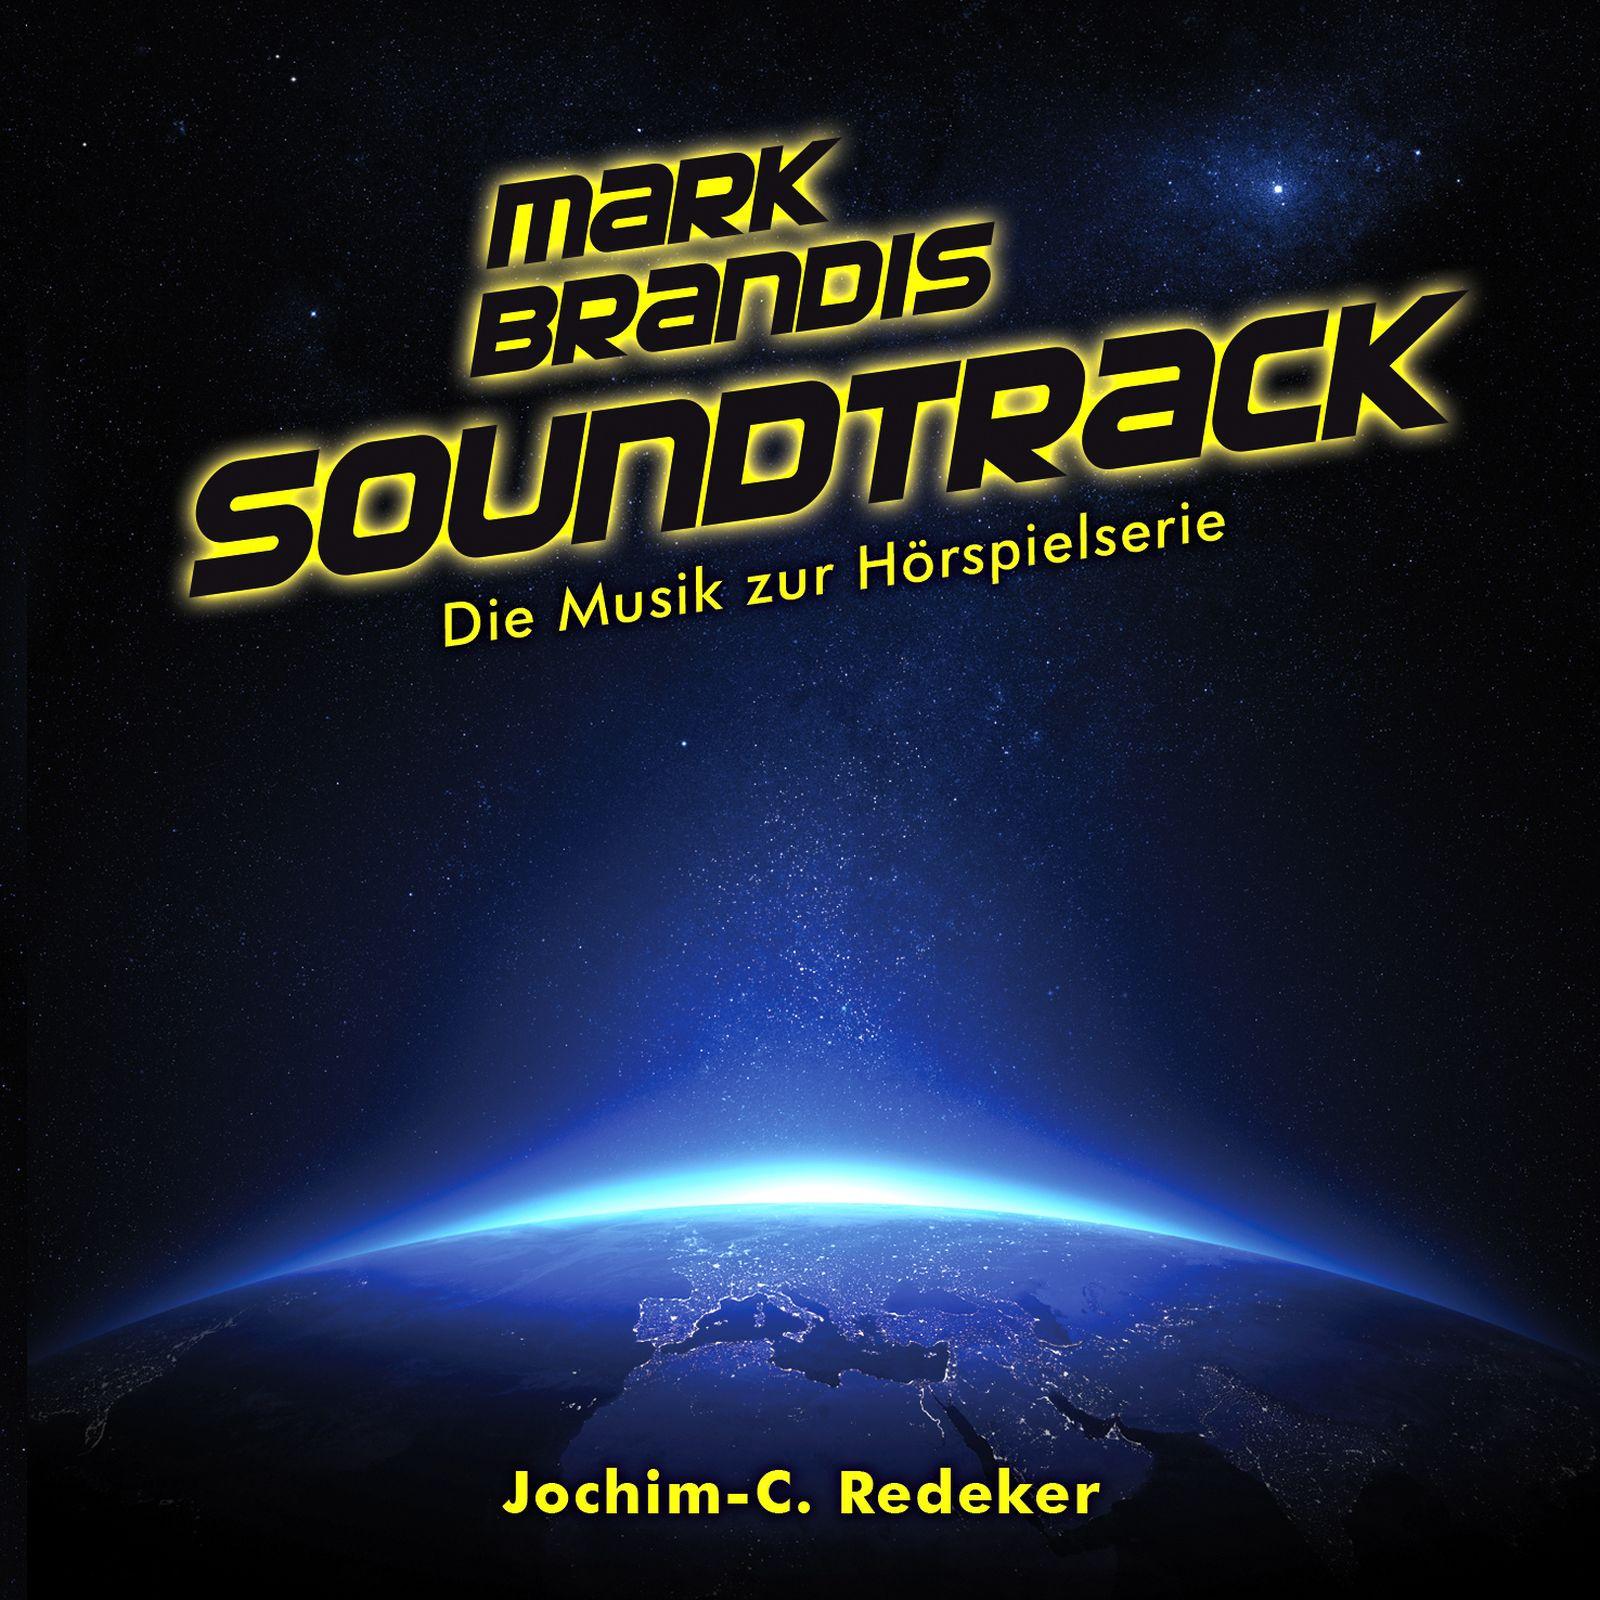 Mark Brandis - Soundtrack - Die Musik zur Hörspielserie